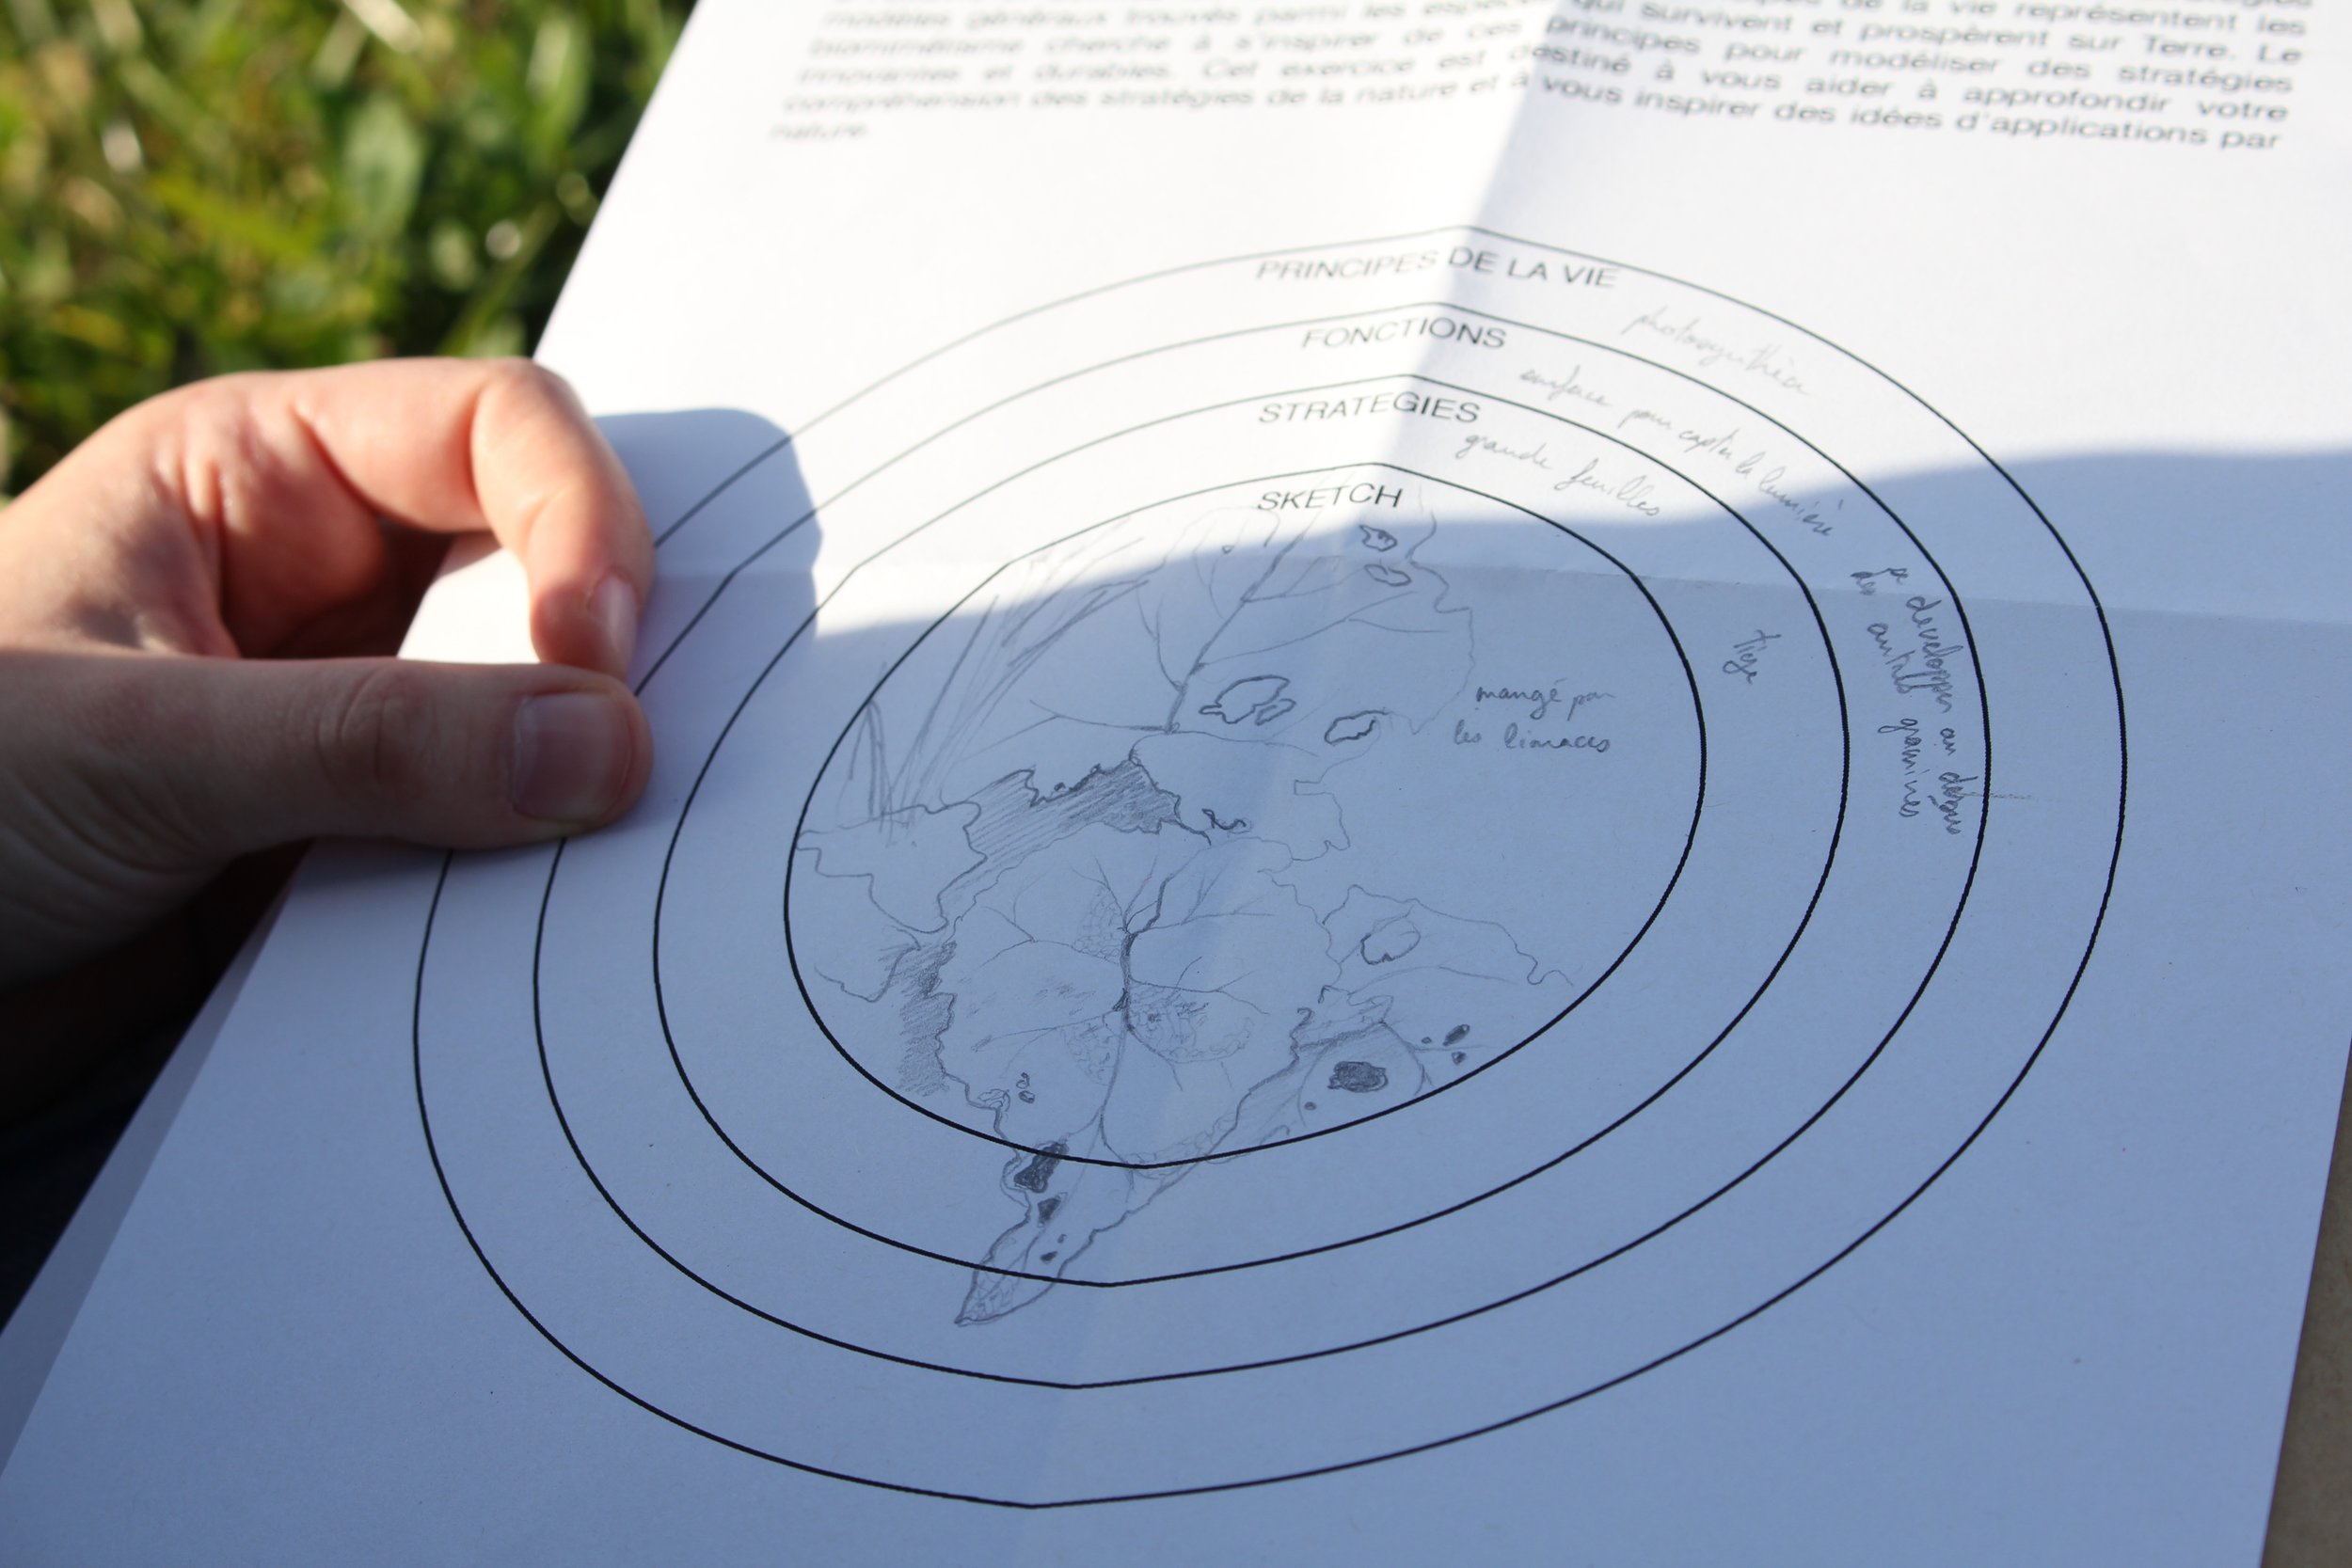 Design exercise around sketching